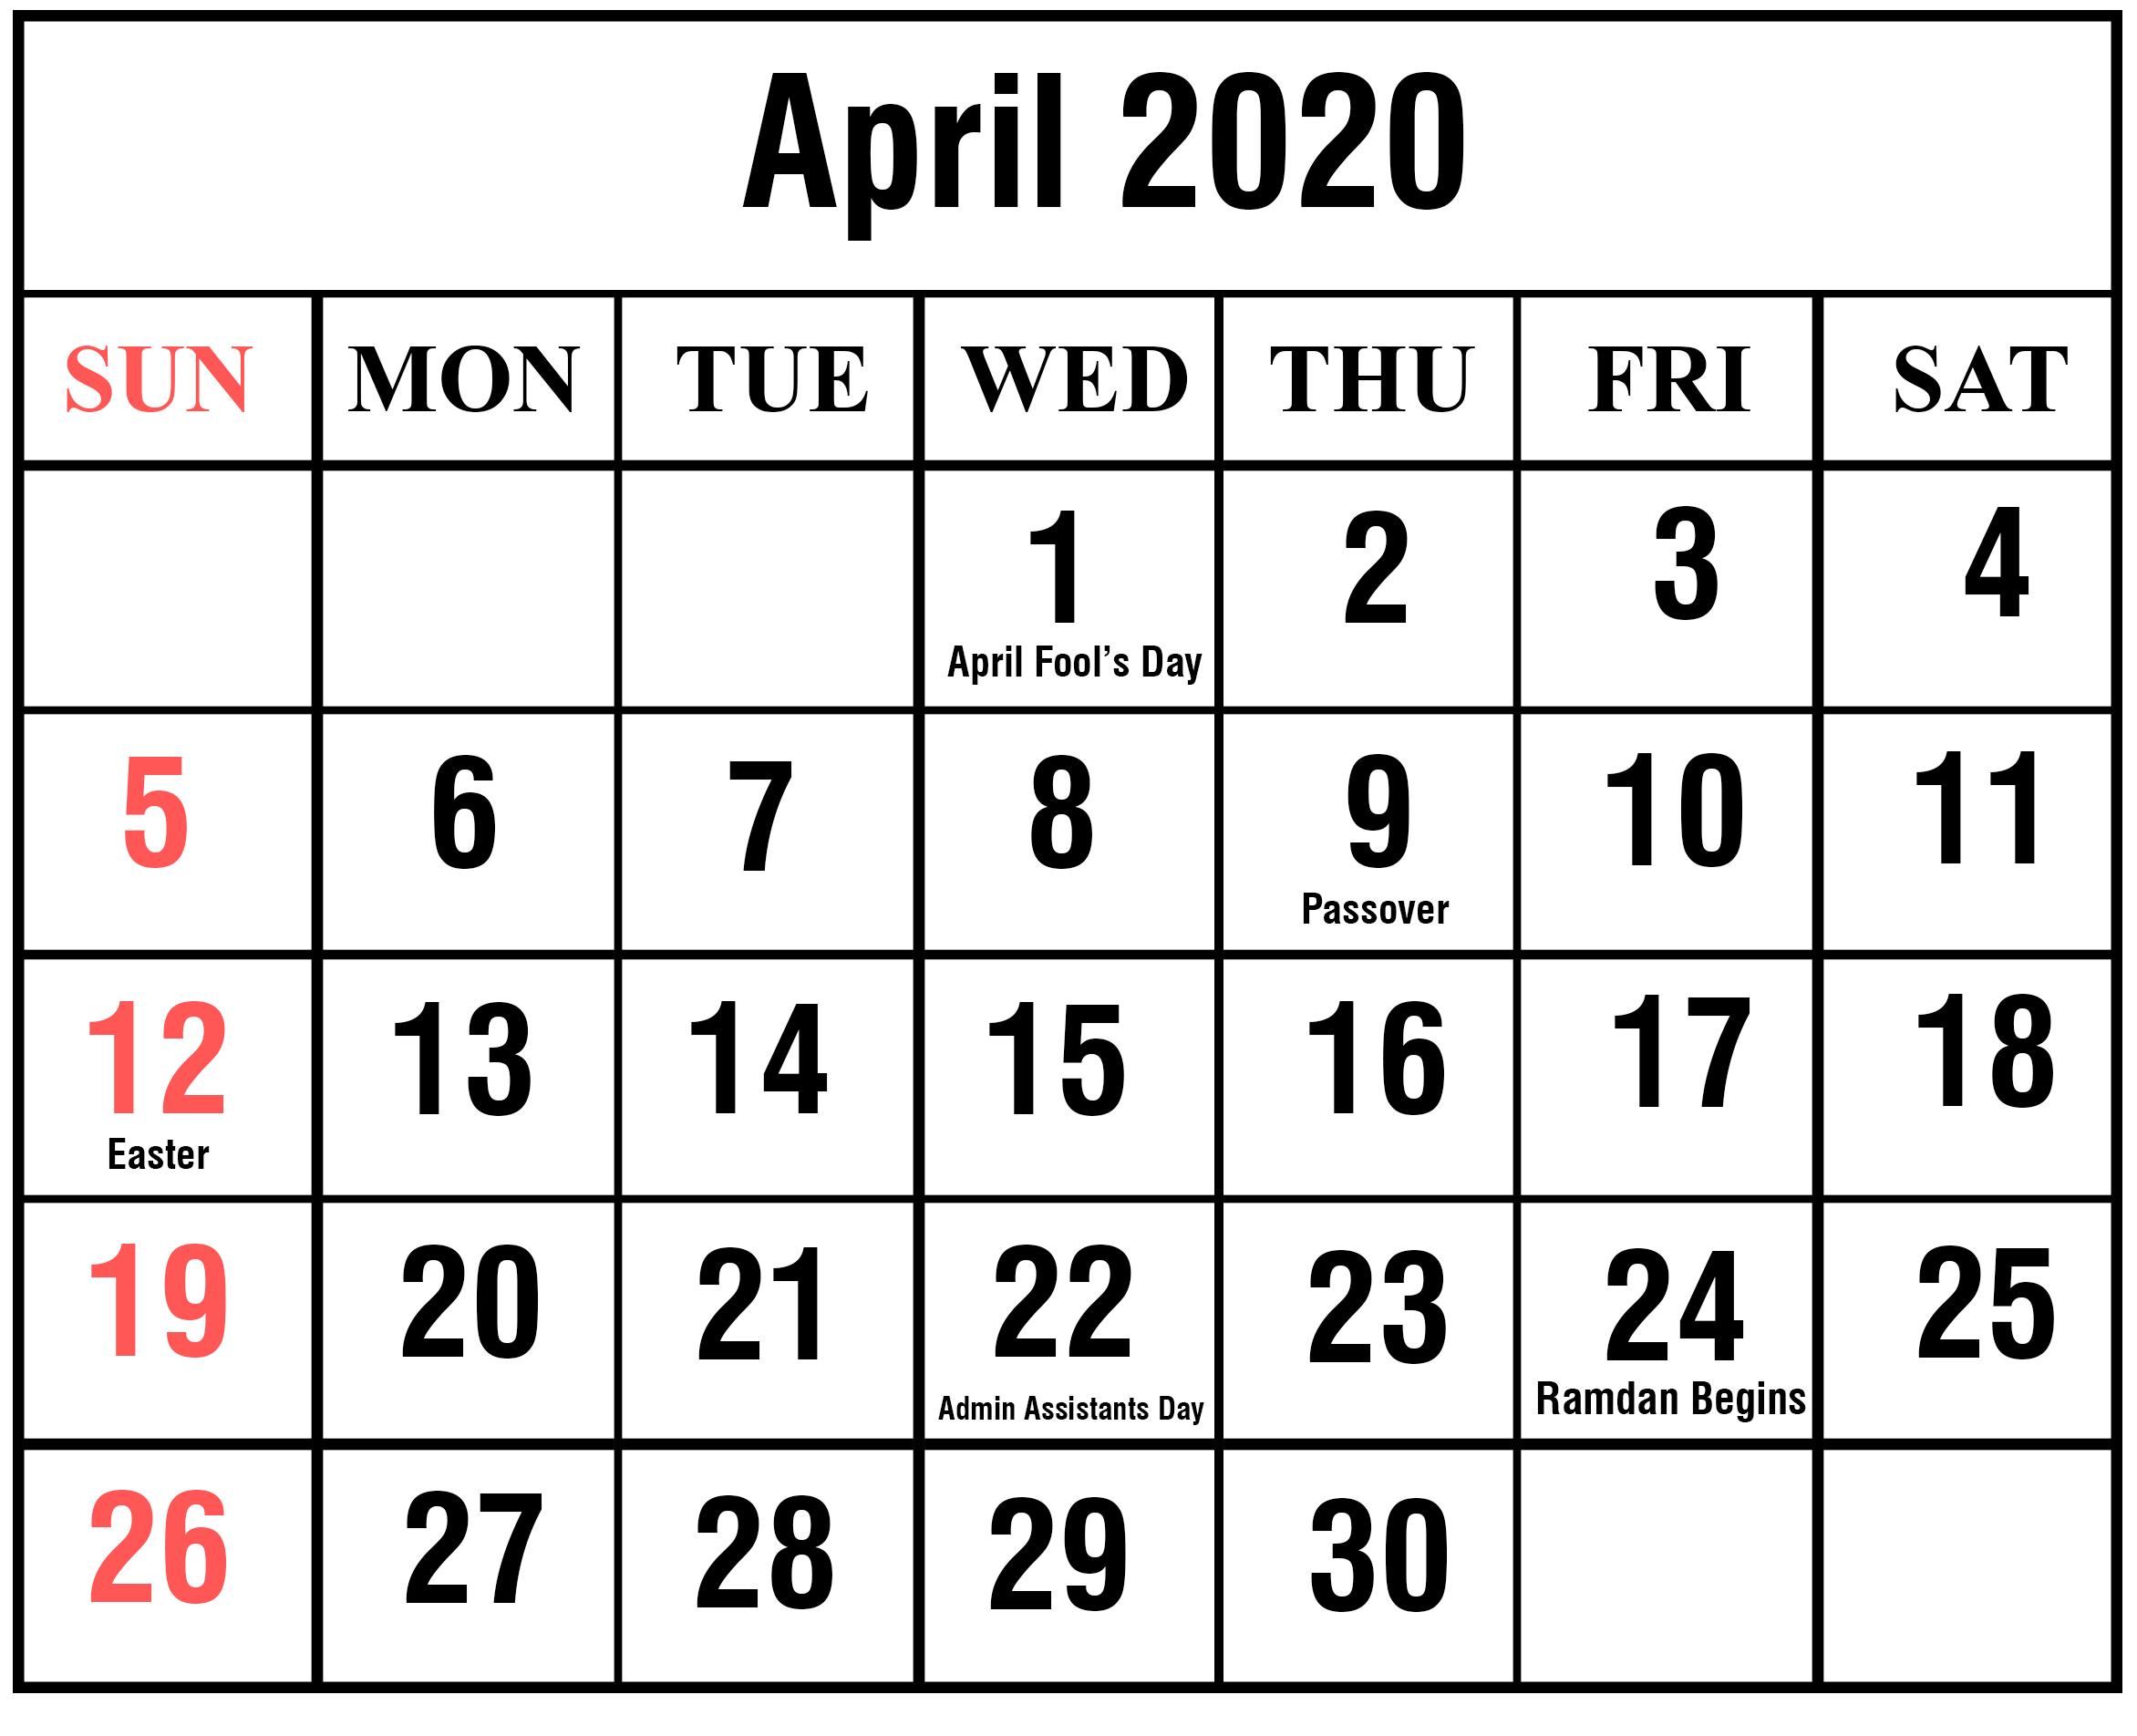 April 2020 Calendar Printable For Kids